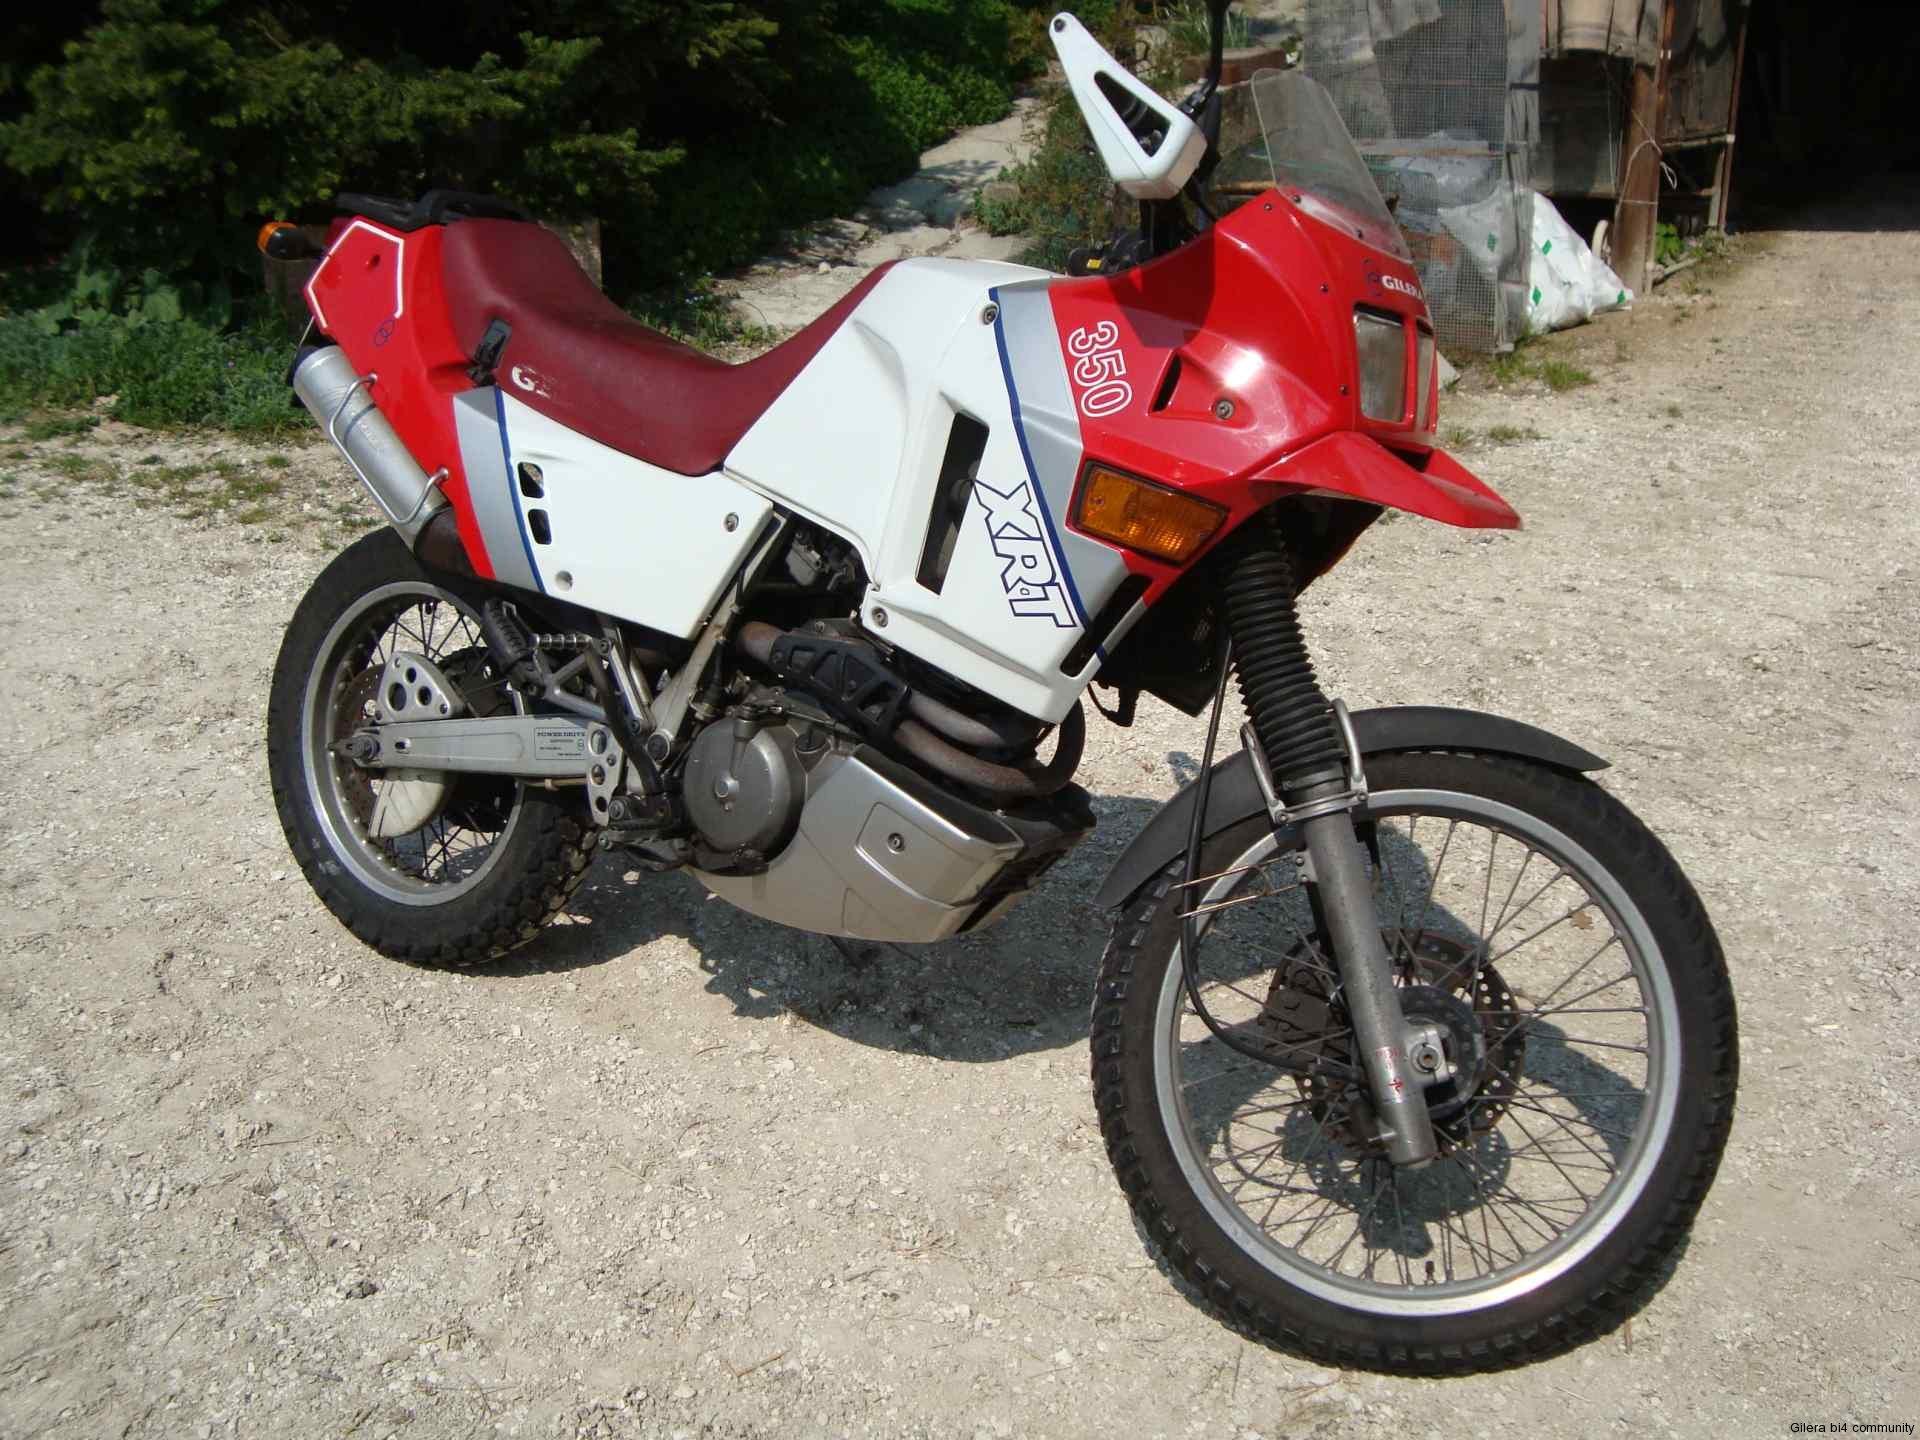 xrt-001s